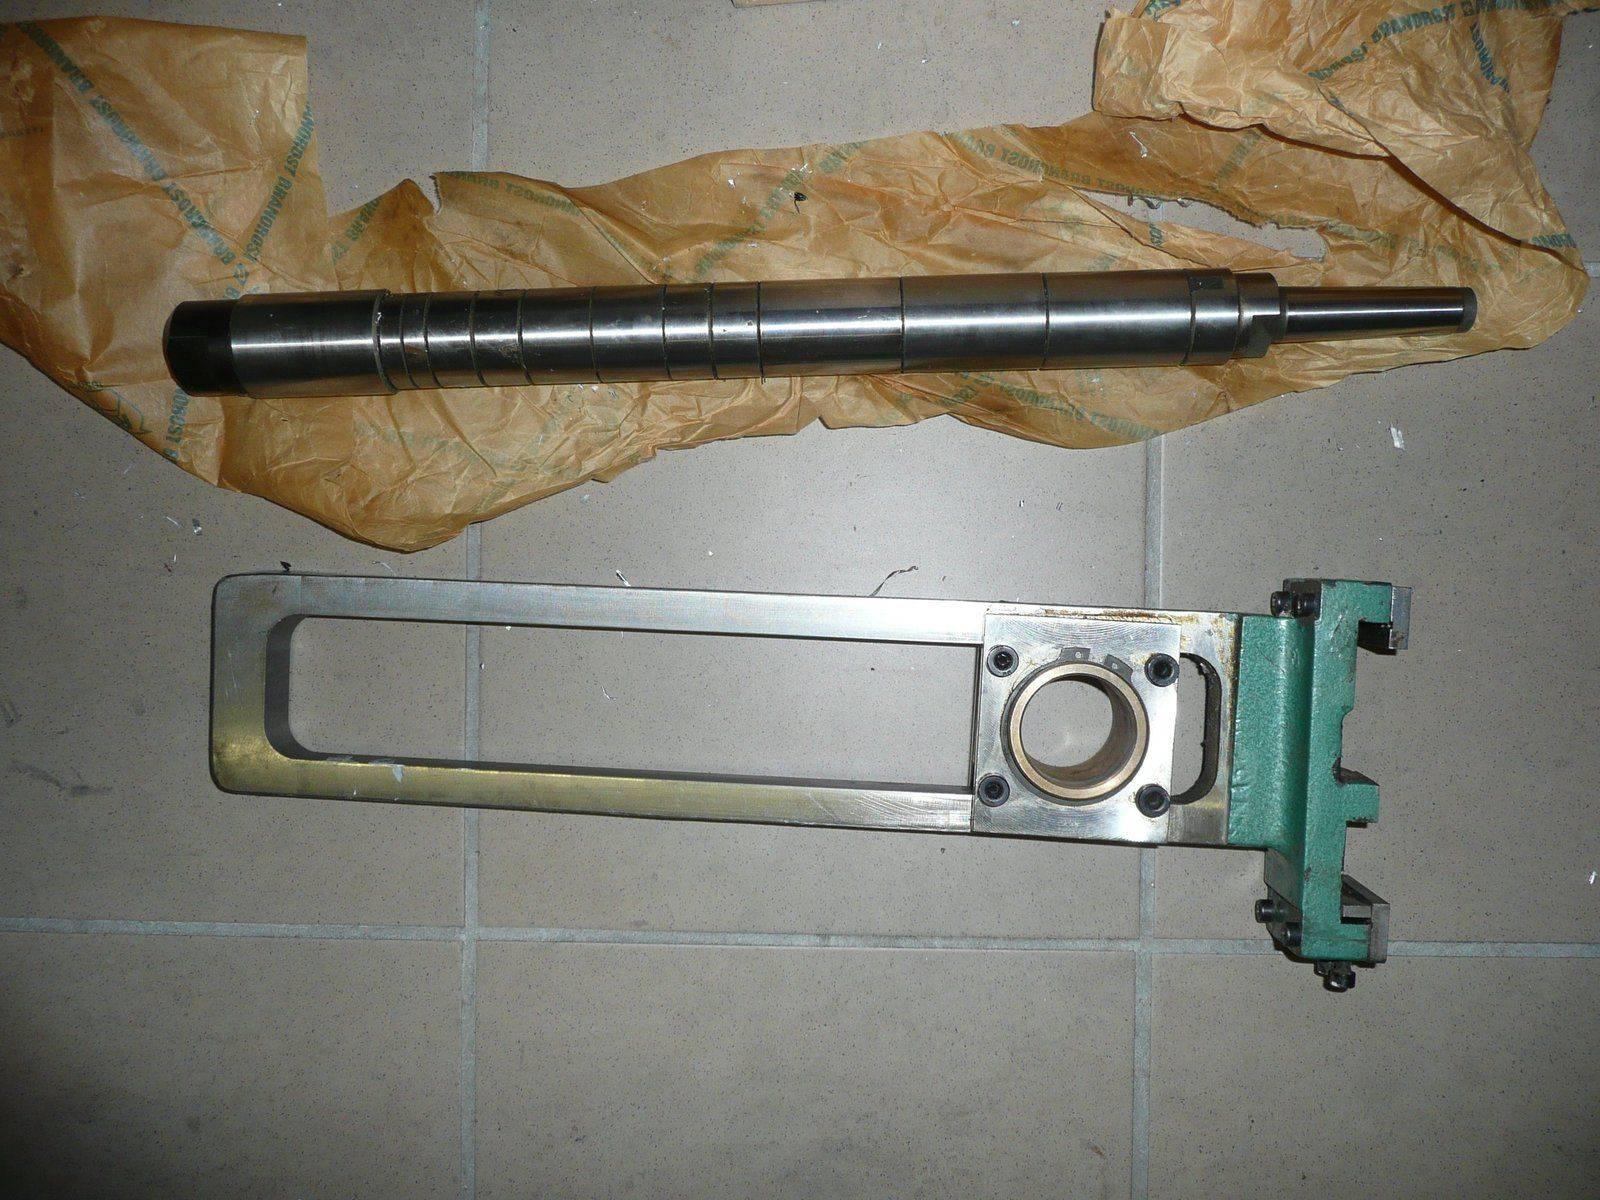 P1130437.JPG